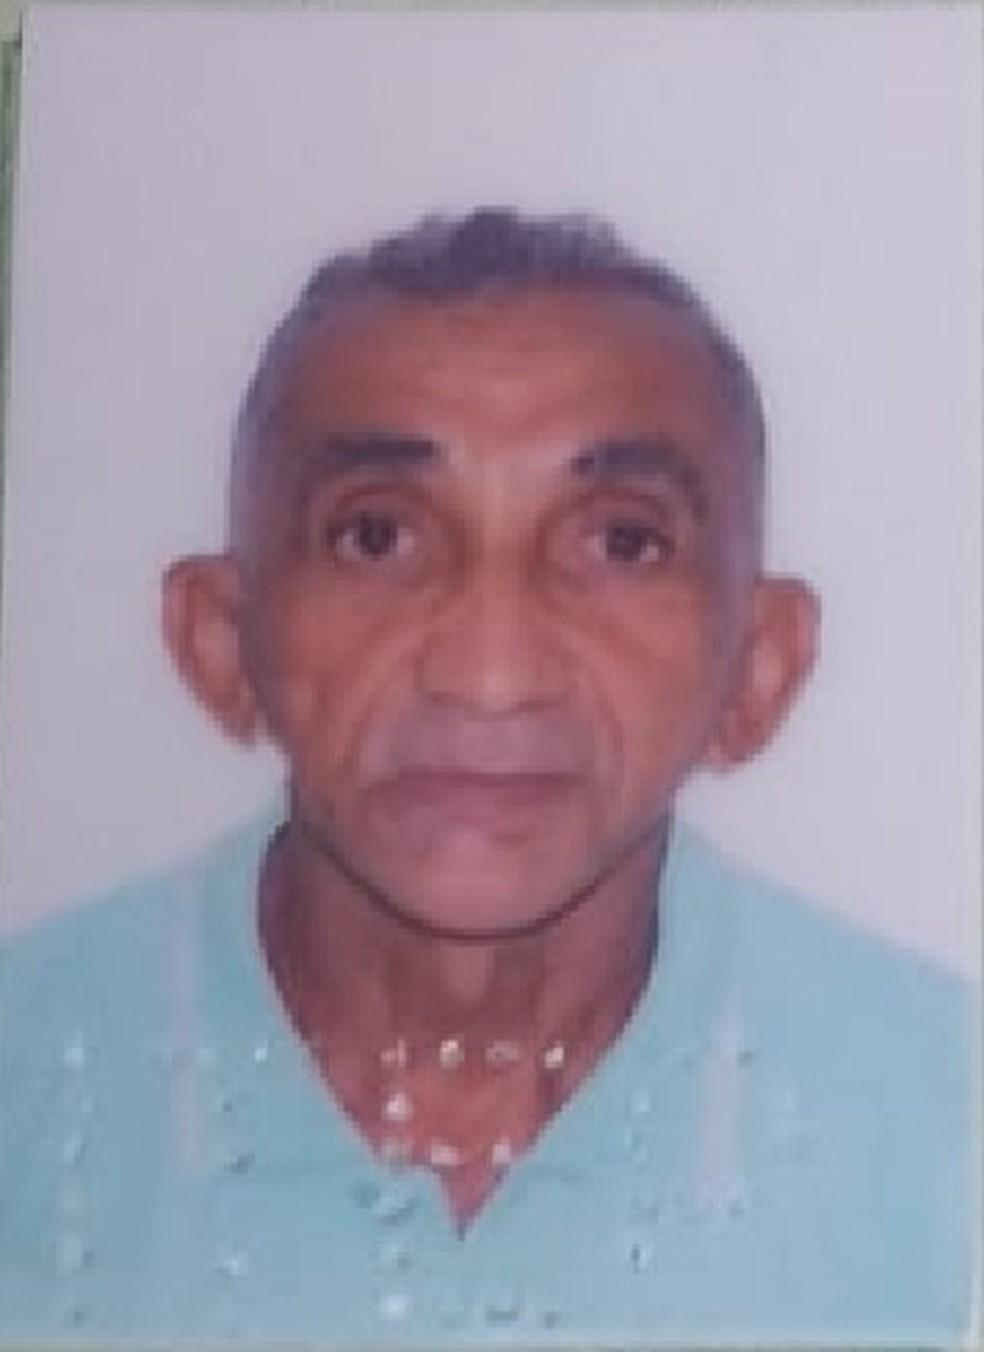 José Donizete Soares, de 60 anos, foi encontrado morto dentro de casa, com marca de facadas nas costas. — Foto: Cedida